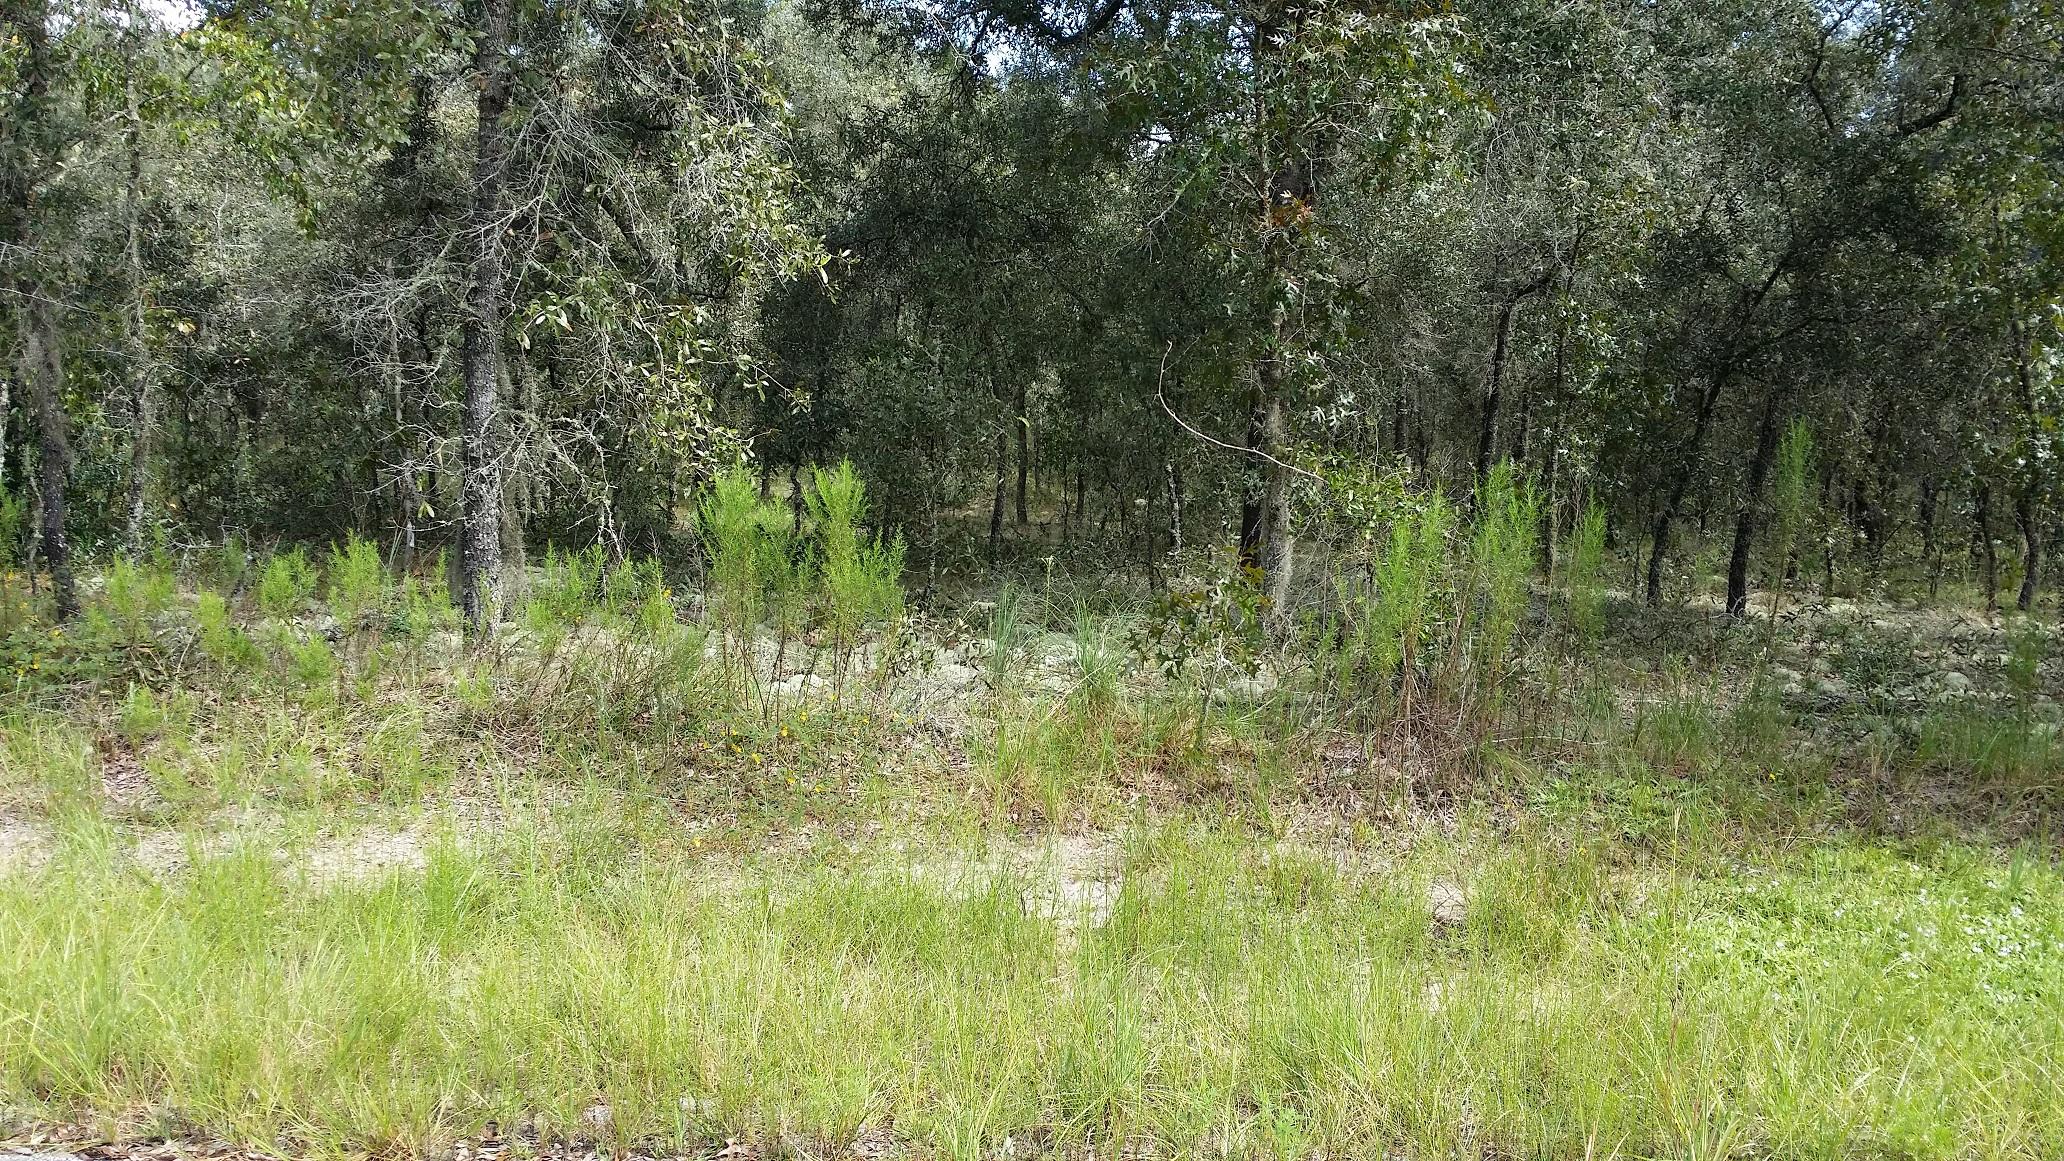 LOT 17 SW 65 LOOP, Dunnellon, Florida 34432